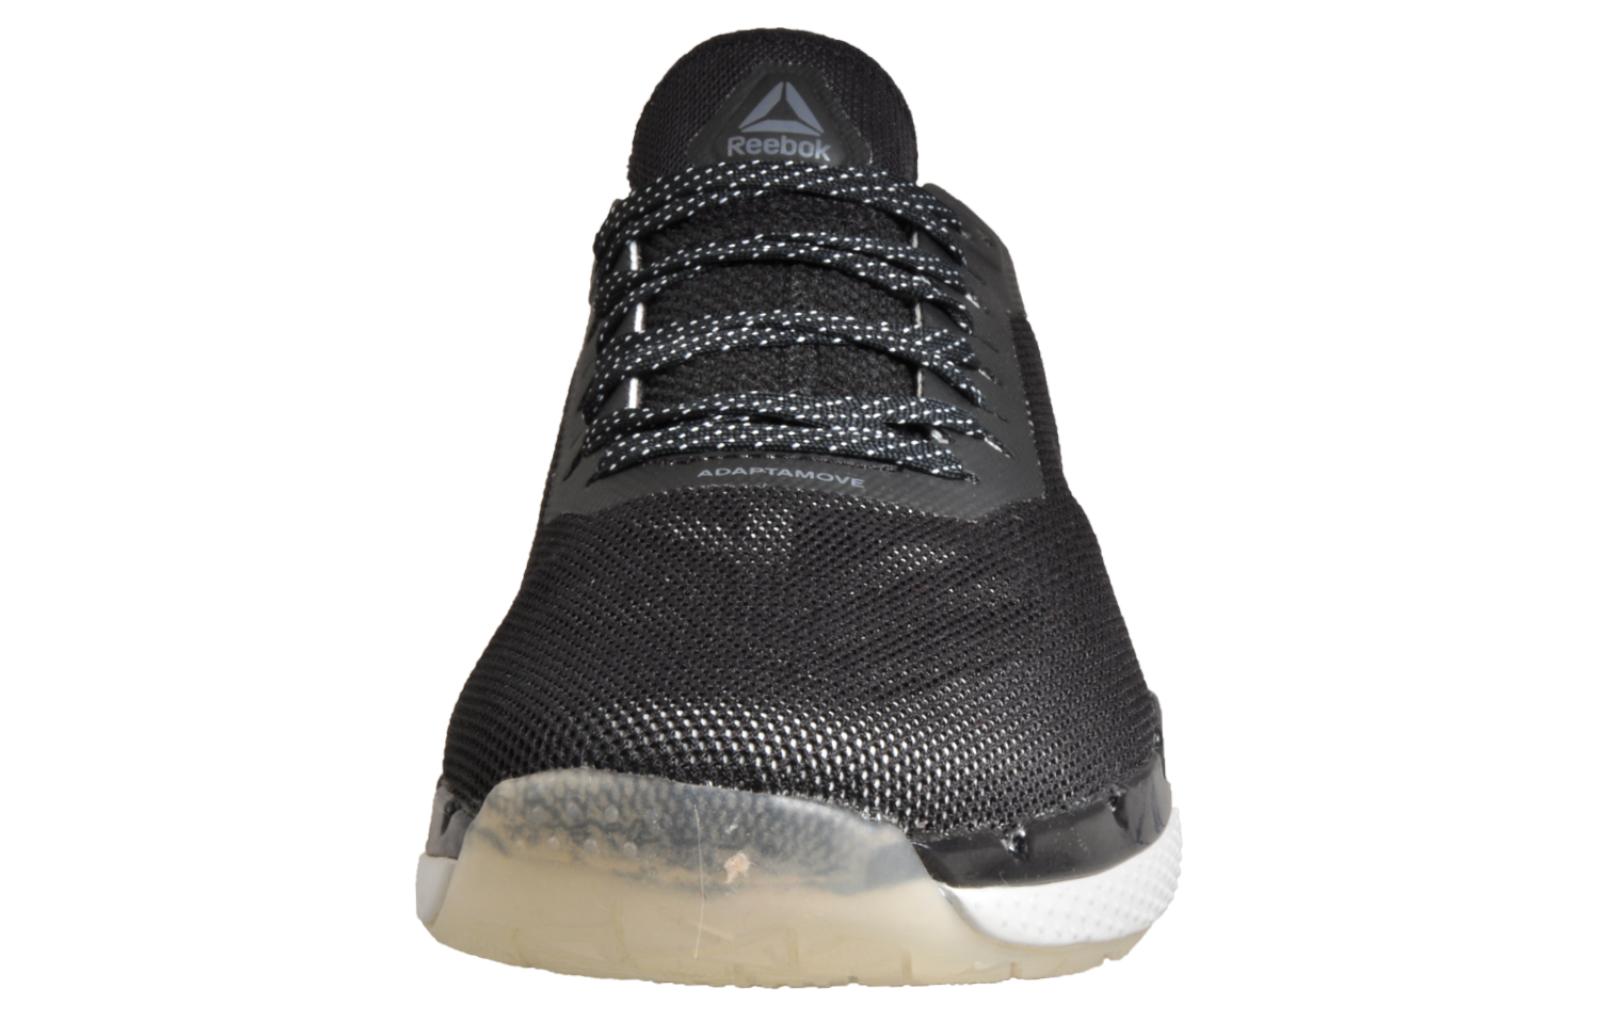 Reebok Cardio Ultra 3.0 Womens Fitness Training Gym Workout Trainers Shoes  Black 7de2fe6e3